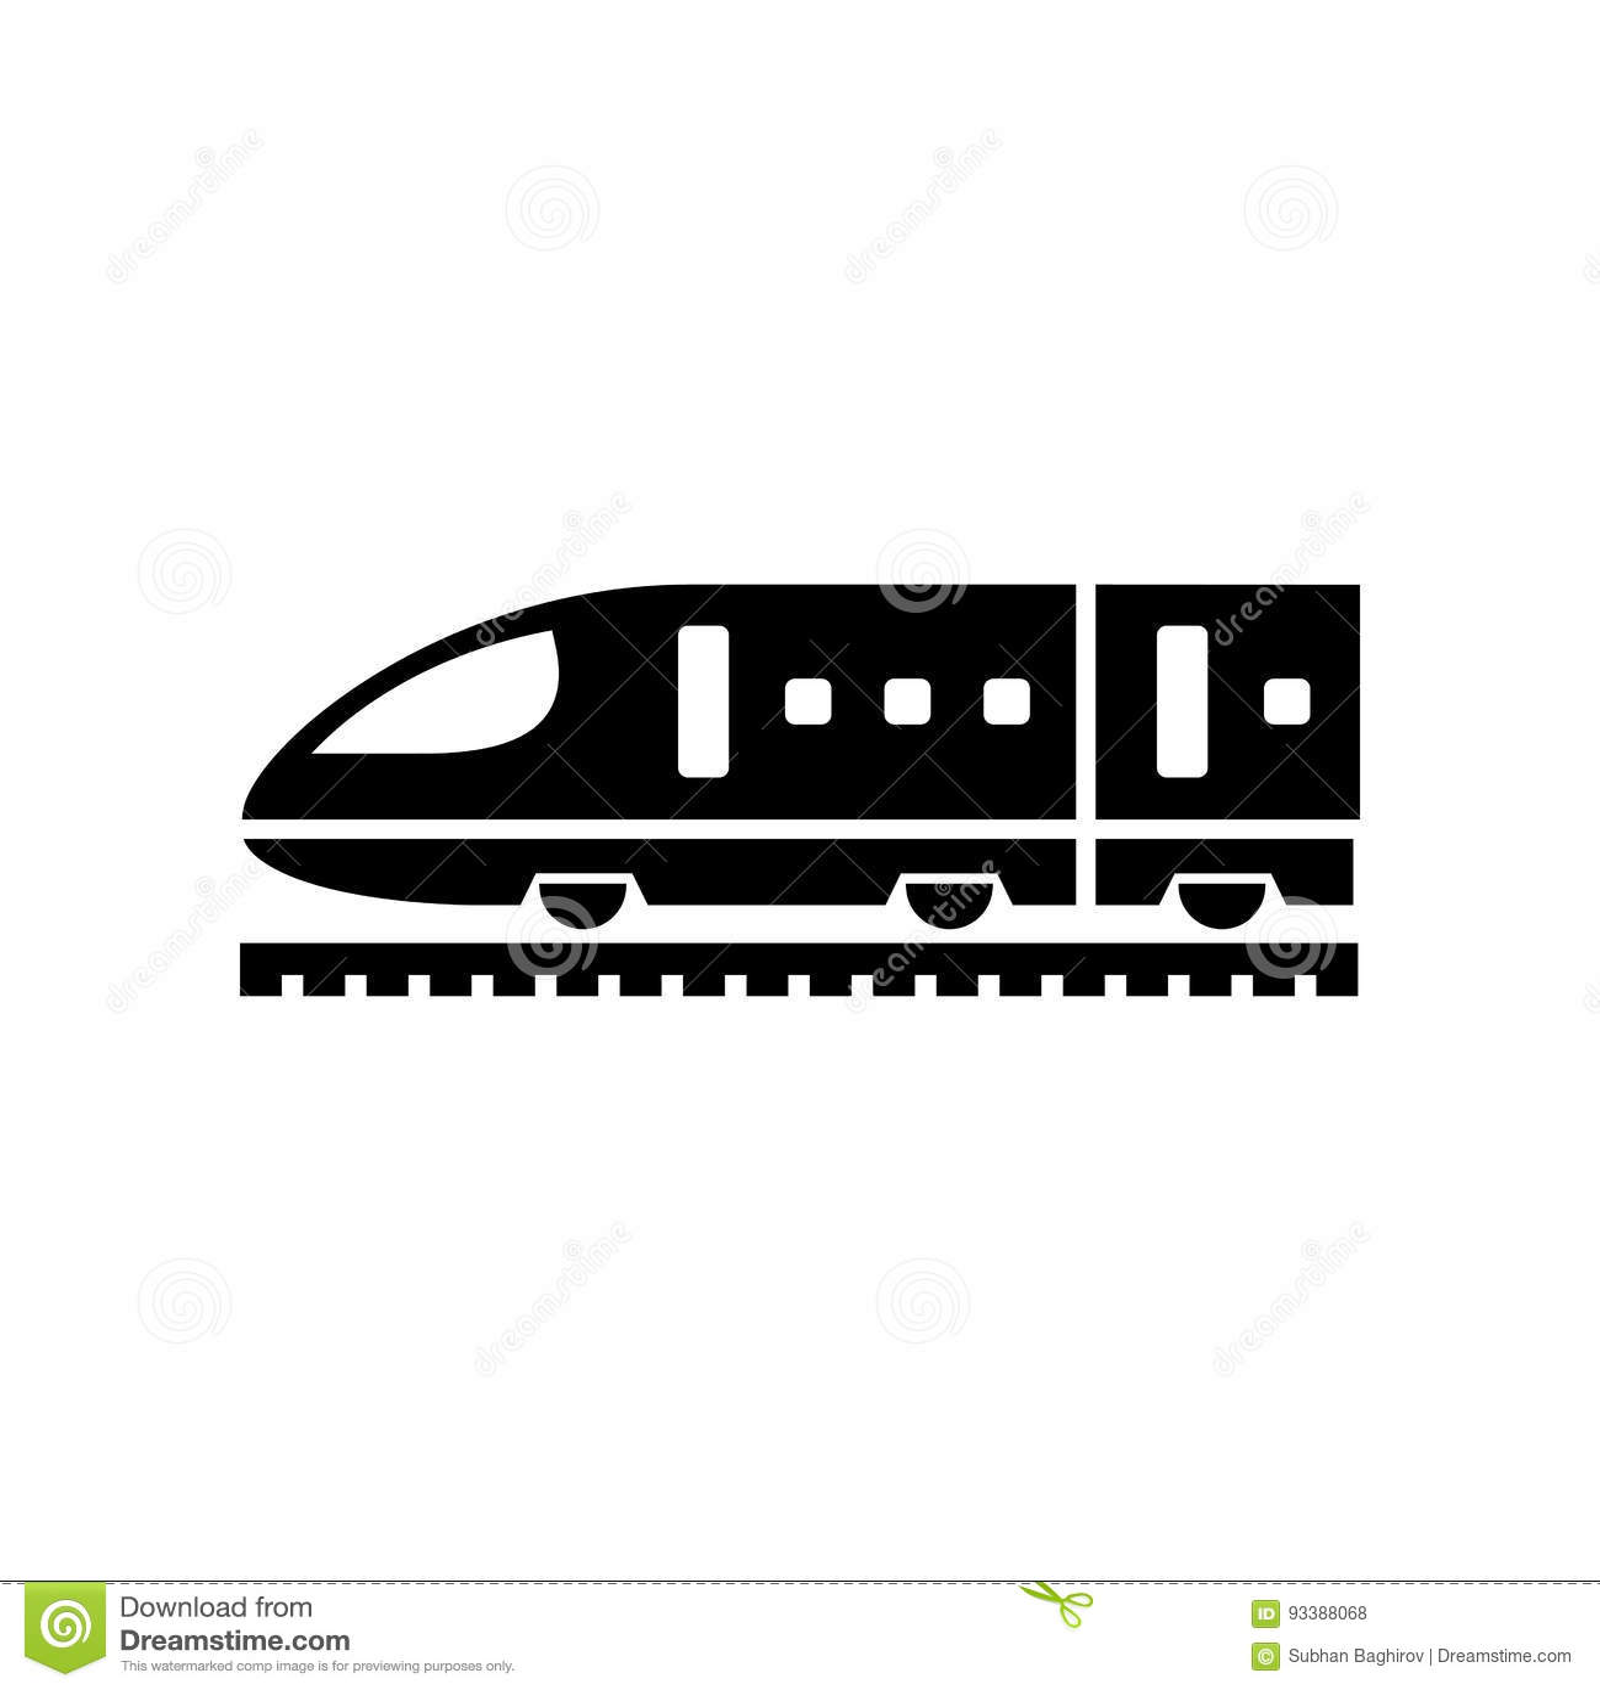 Train icon simple flat vector illustration. Speed train sign